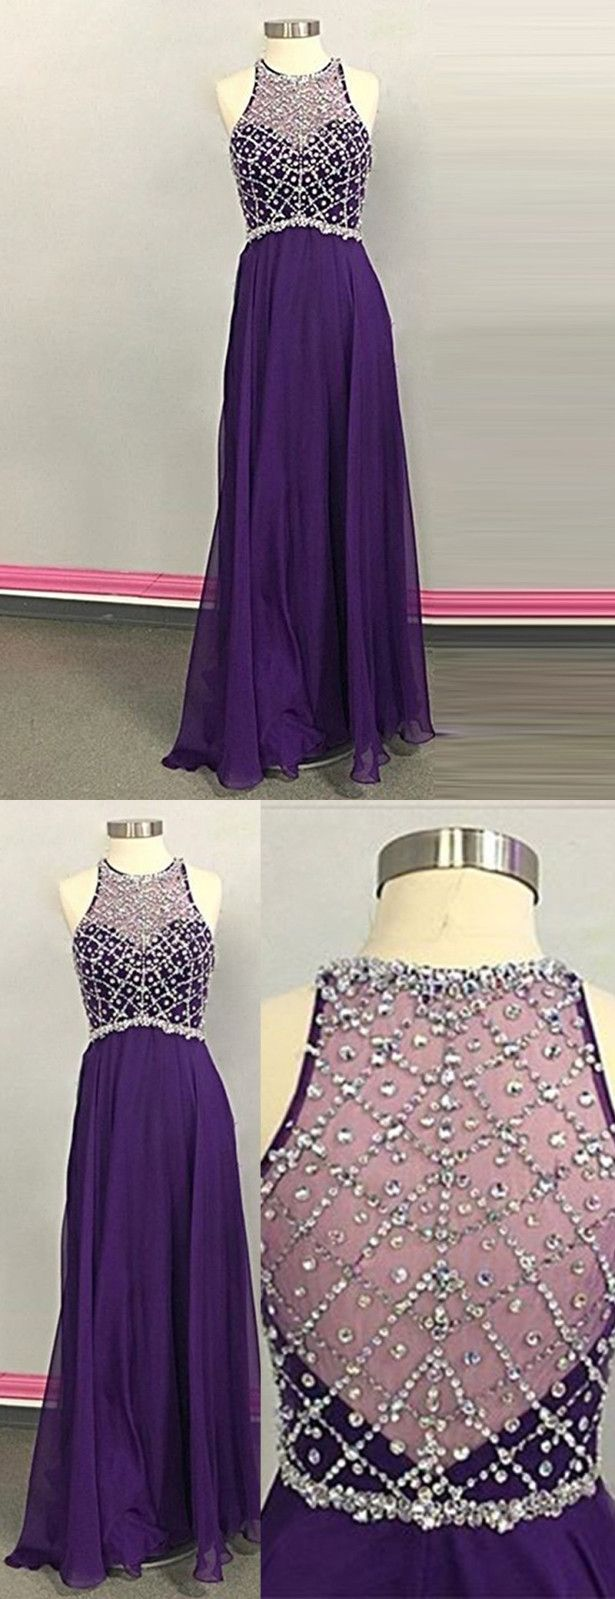 Aline jewel sleeveless illusion back long purple prom dress with